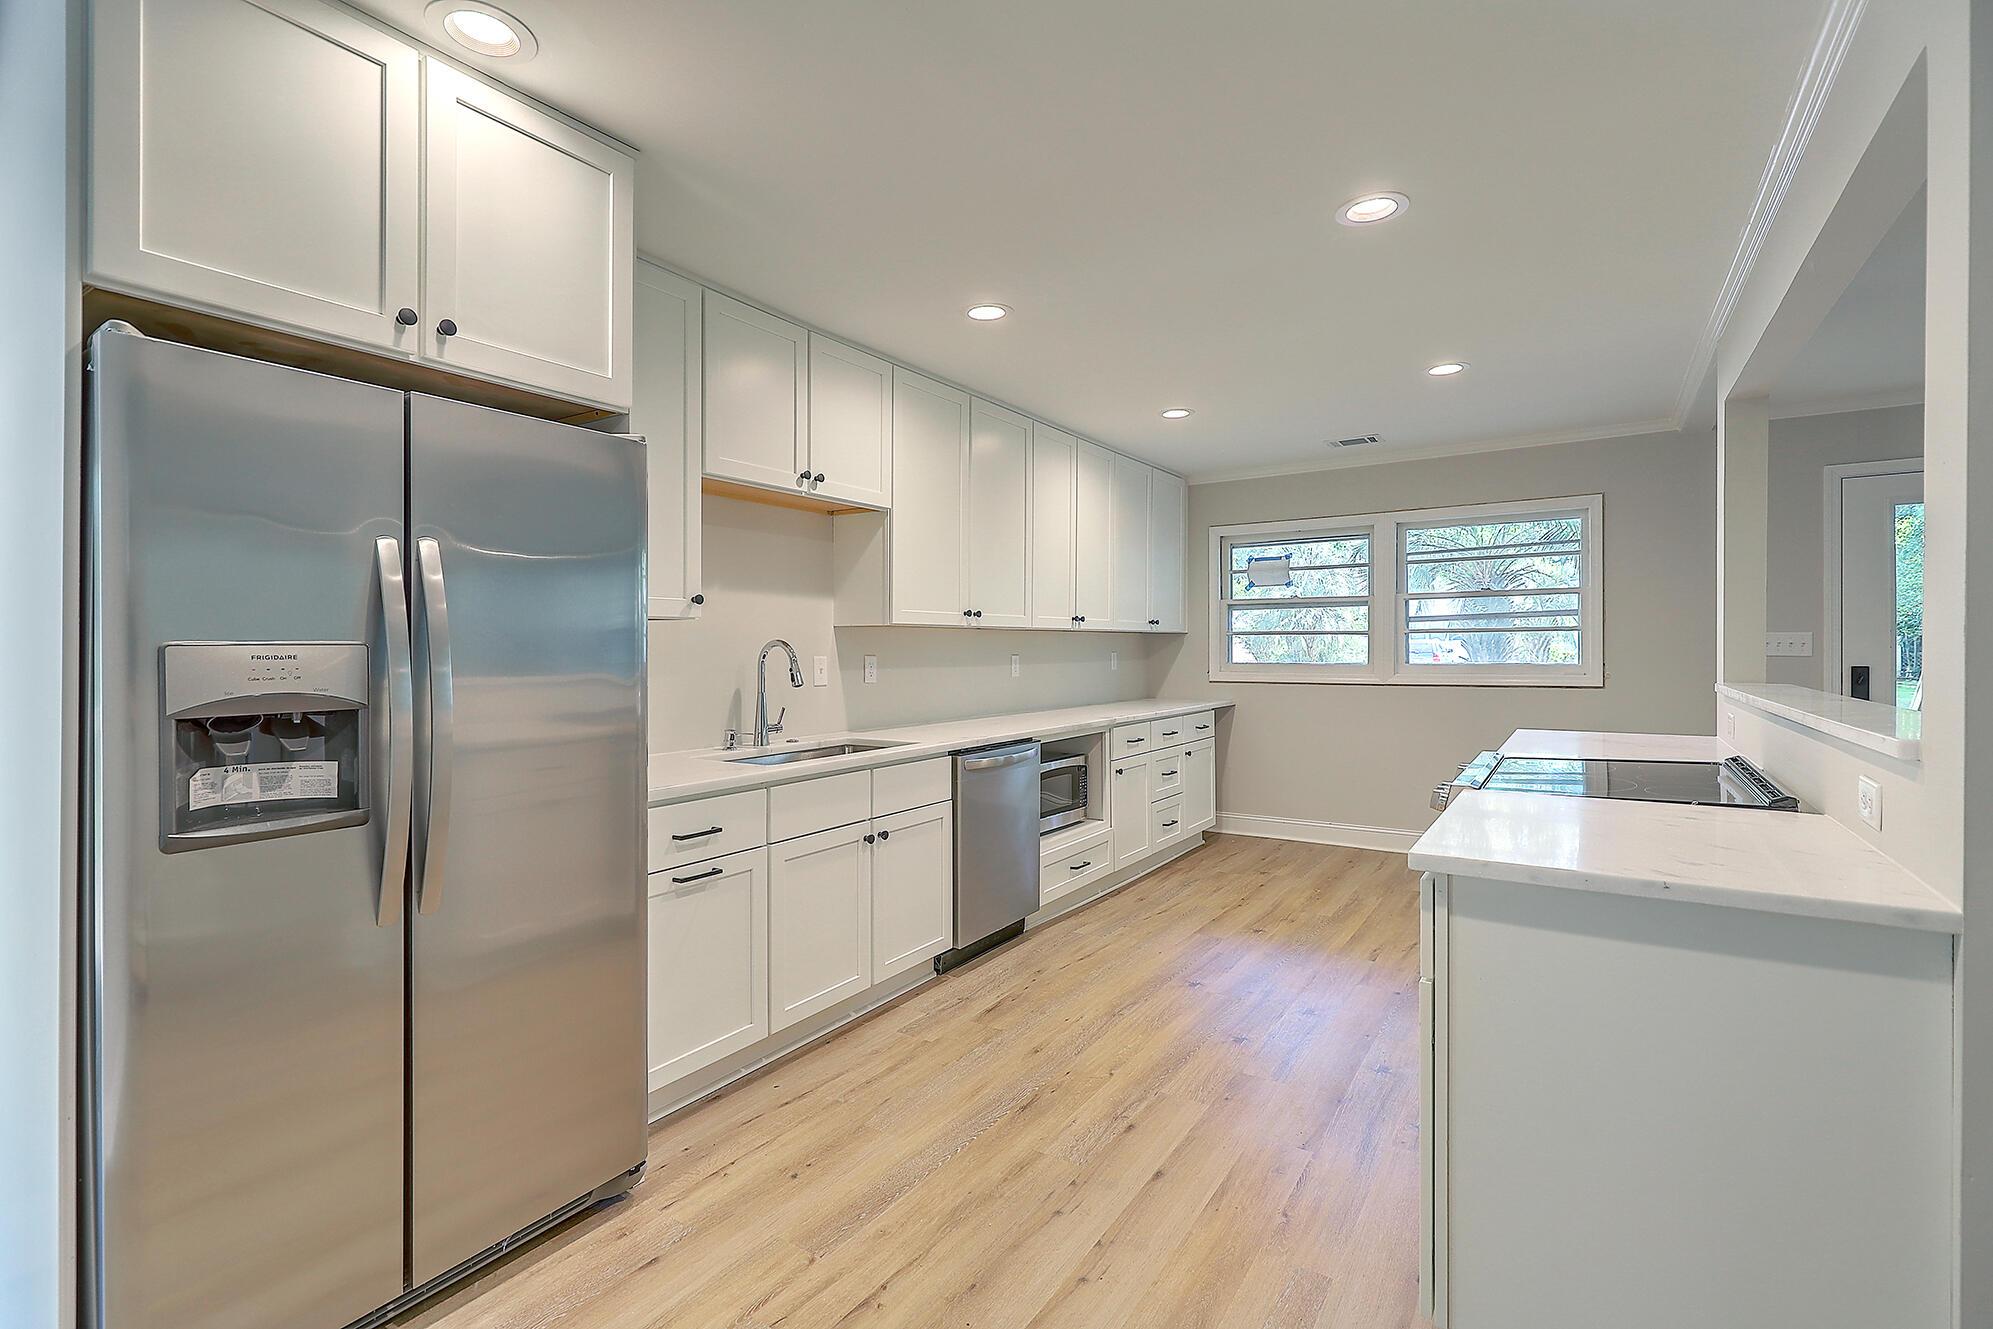 Lawton Bluff Homes For Sale - 847 Quail, Charleston, SC - 2